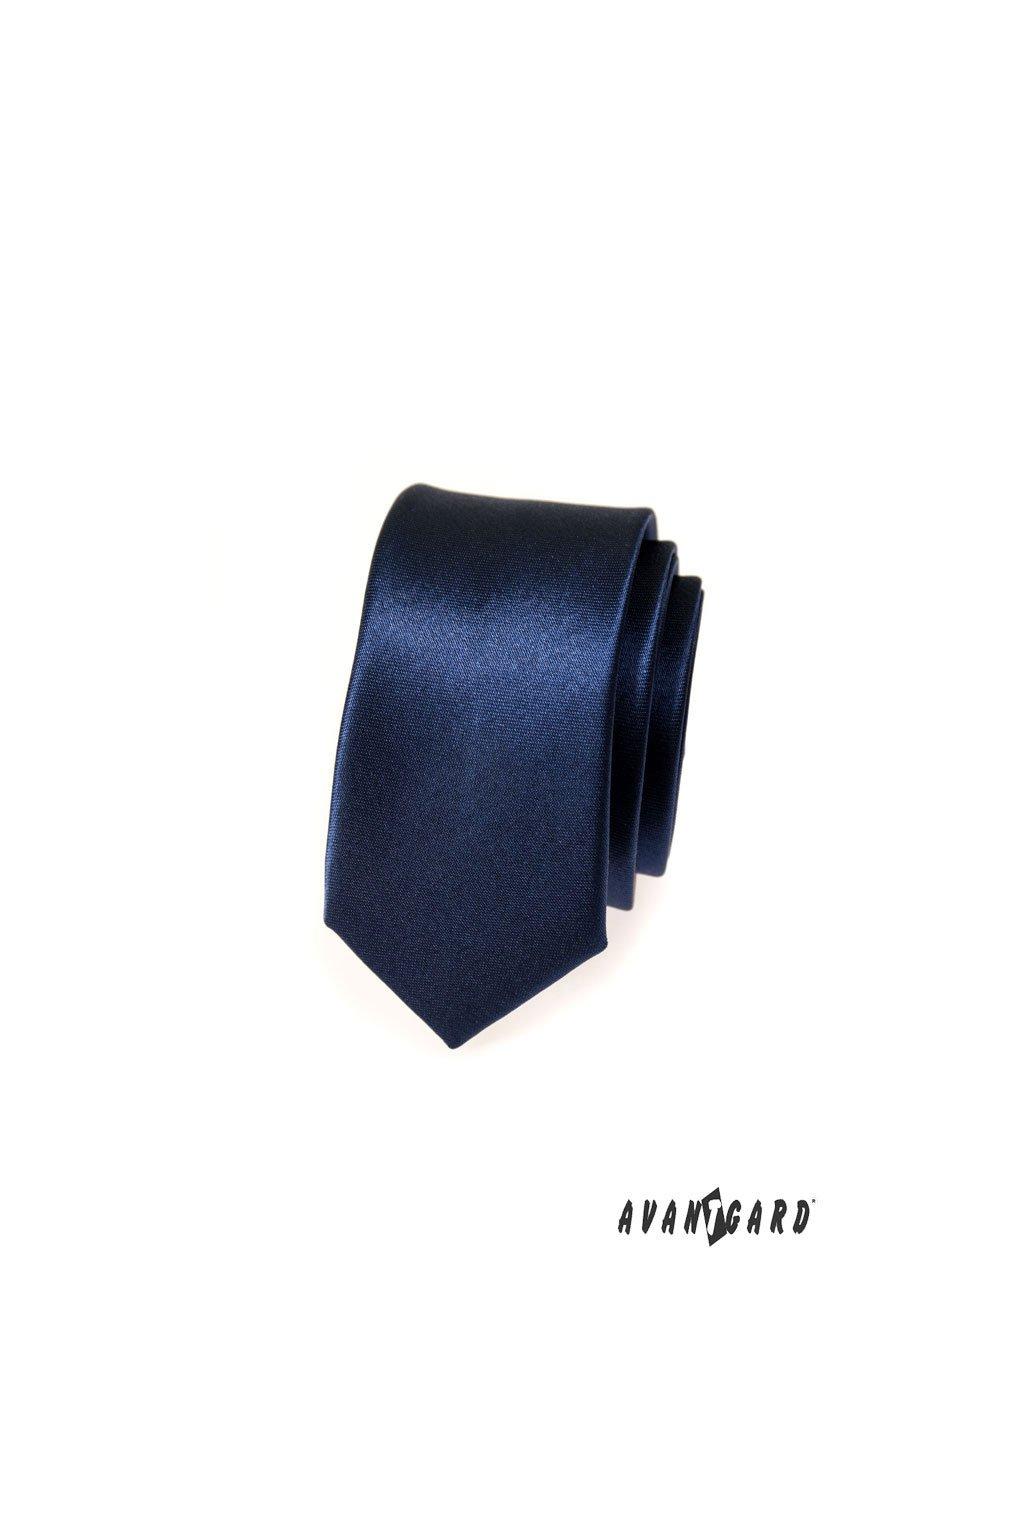 Modrá kravata Slim tmavá 551 - 782